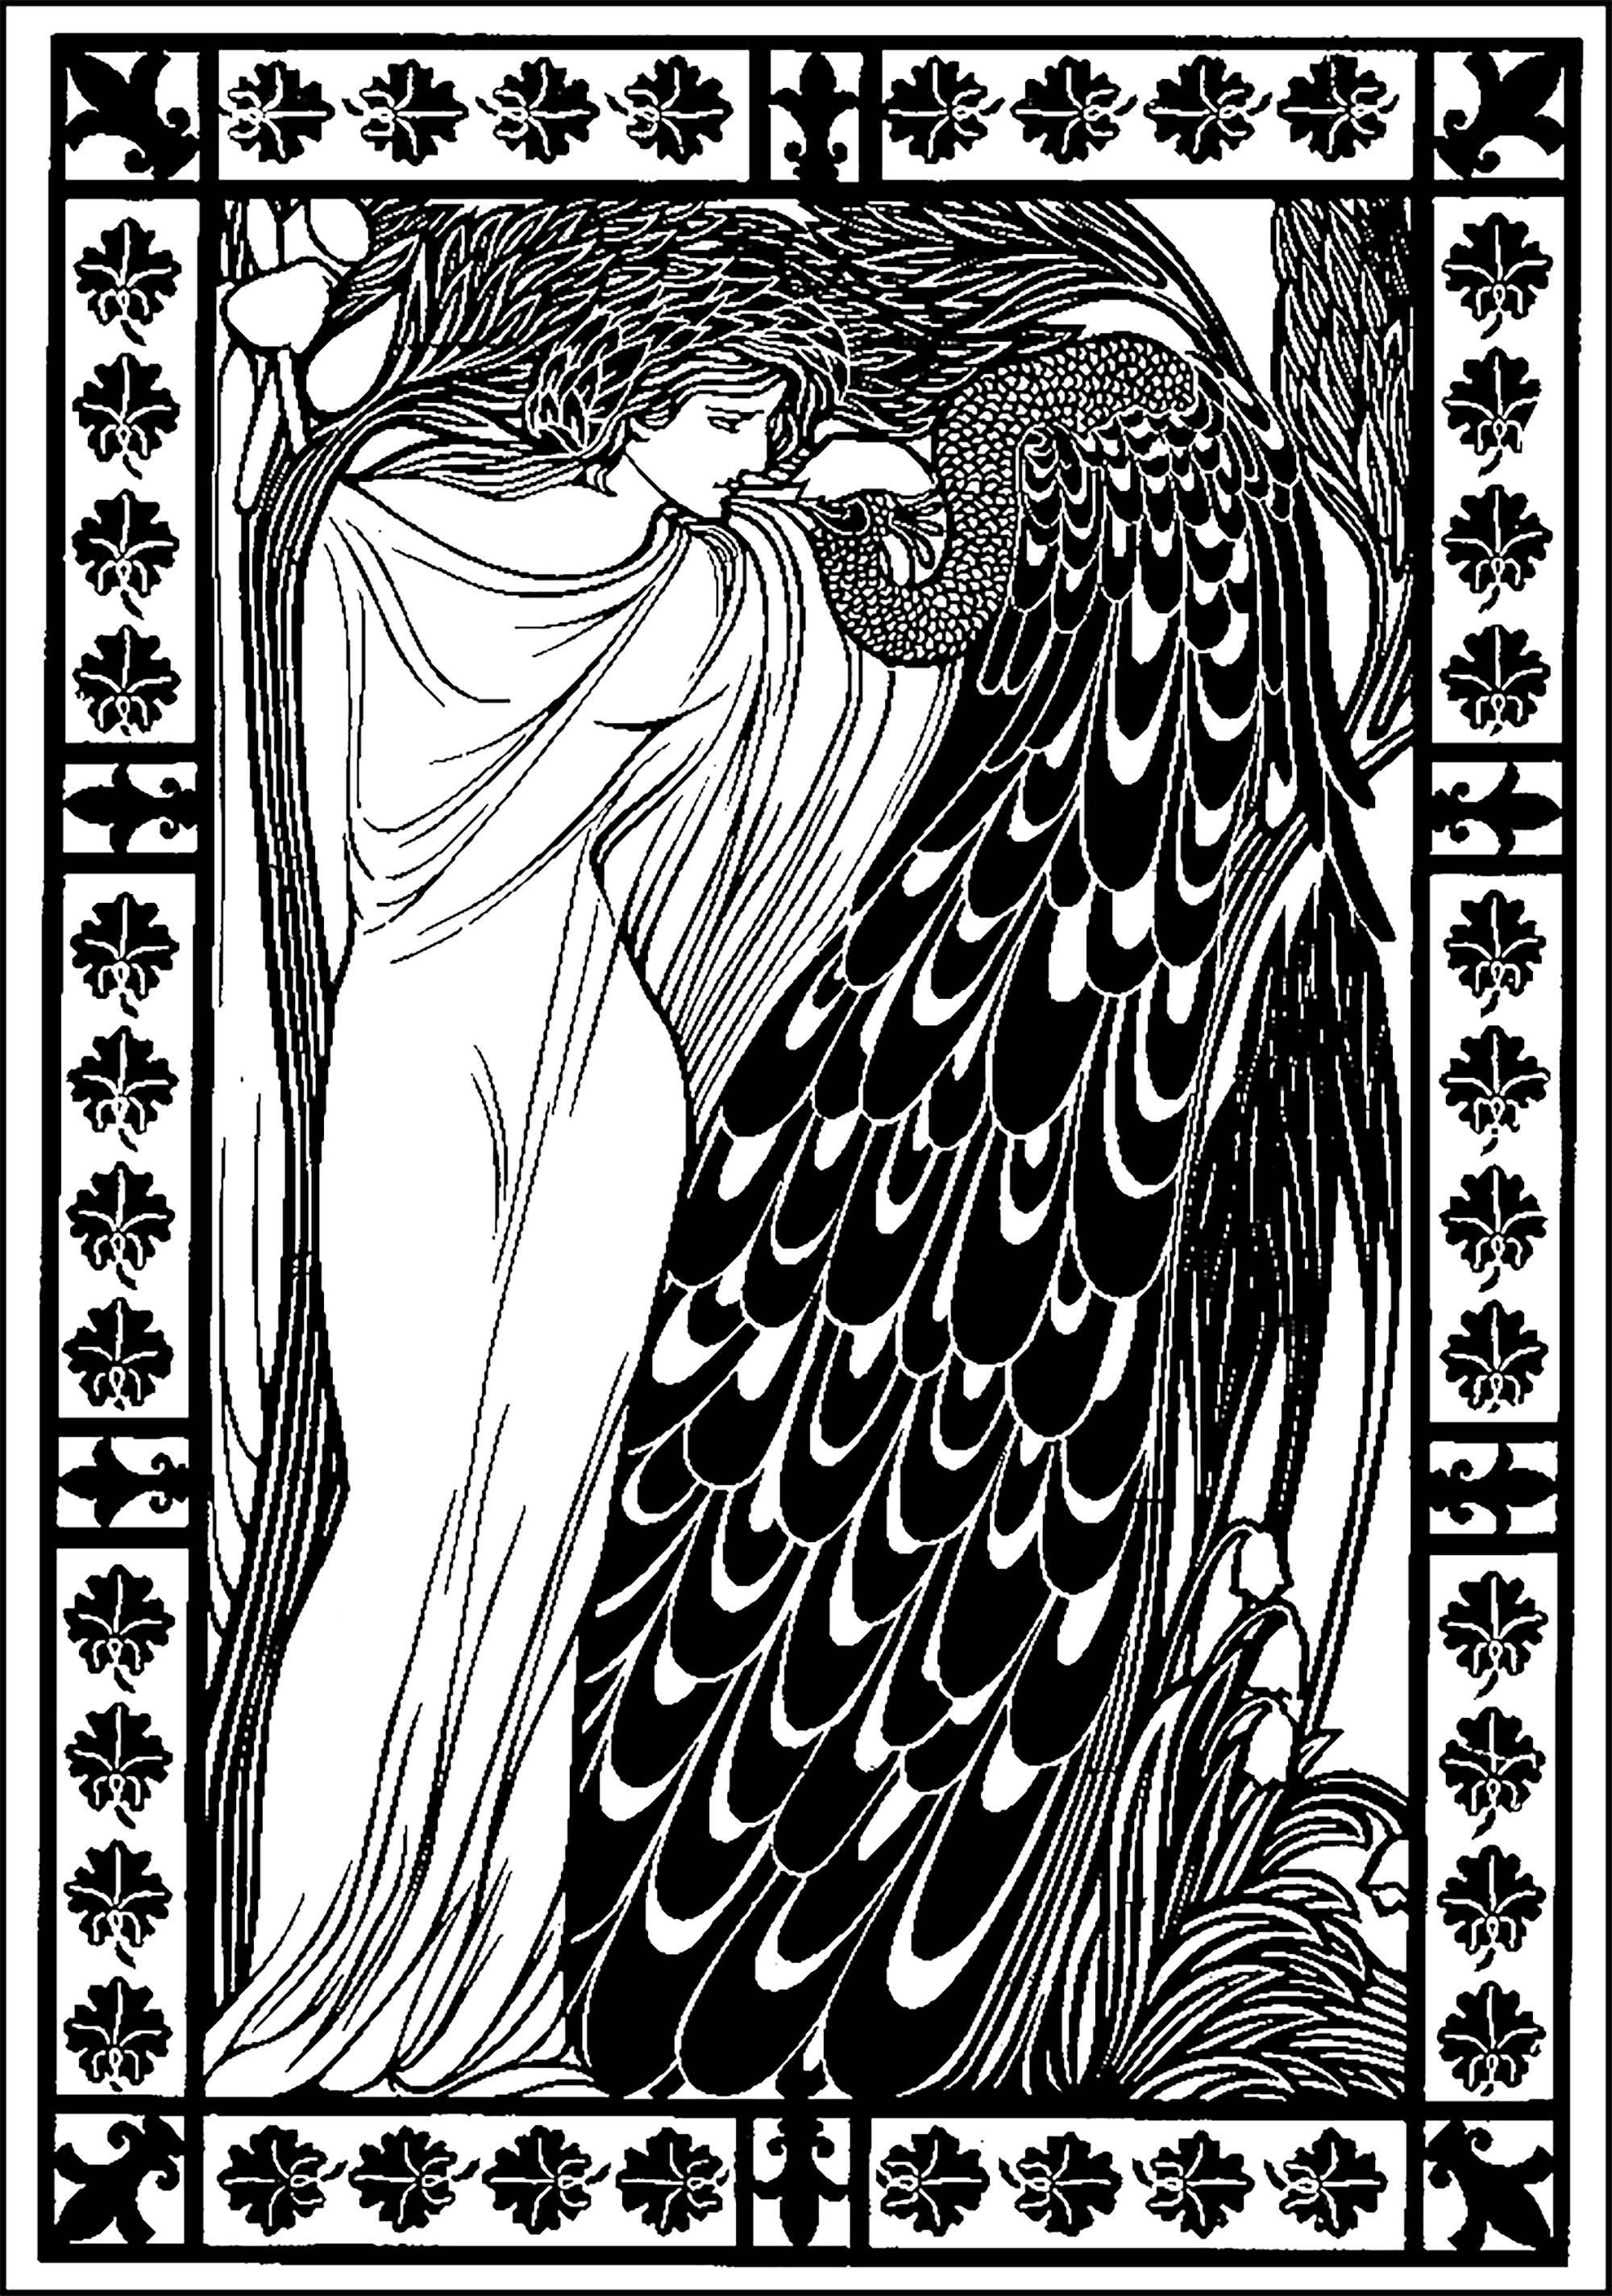 Art nouveau 66548 art nouveau disegni da colorare per - Arte celtica colorare le pagine da colorare ...